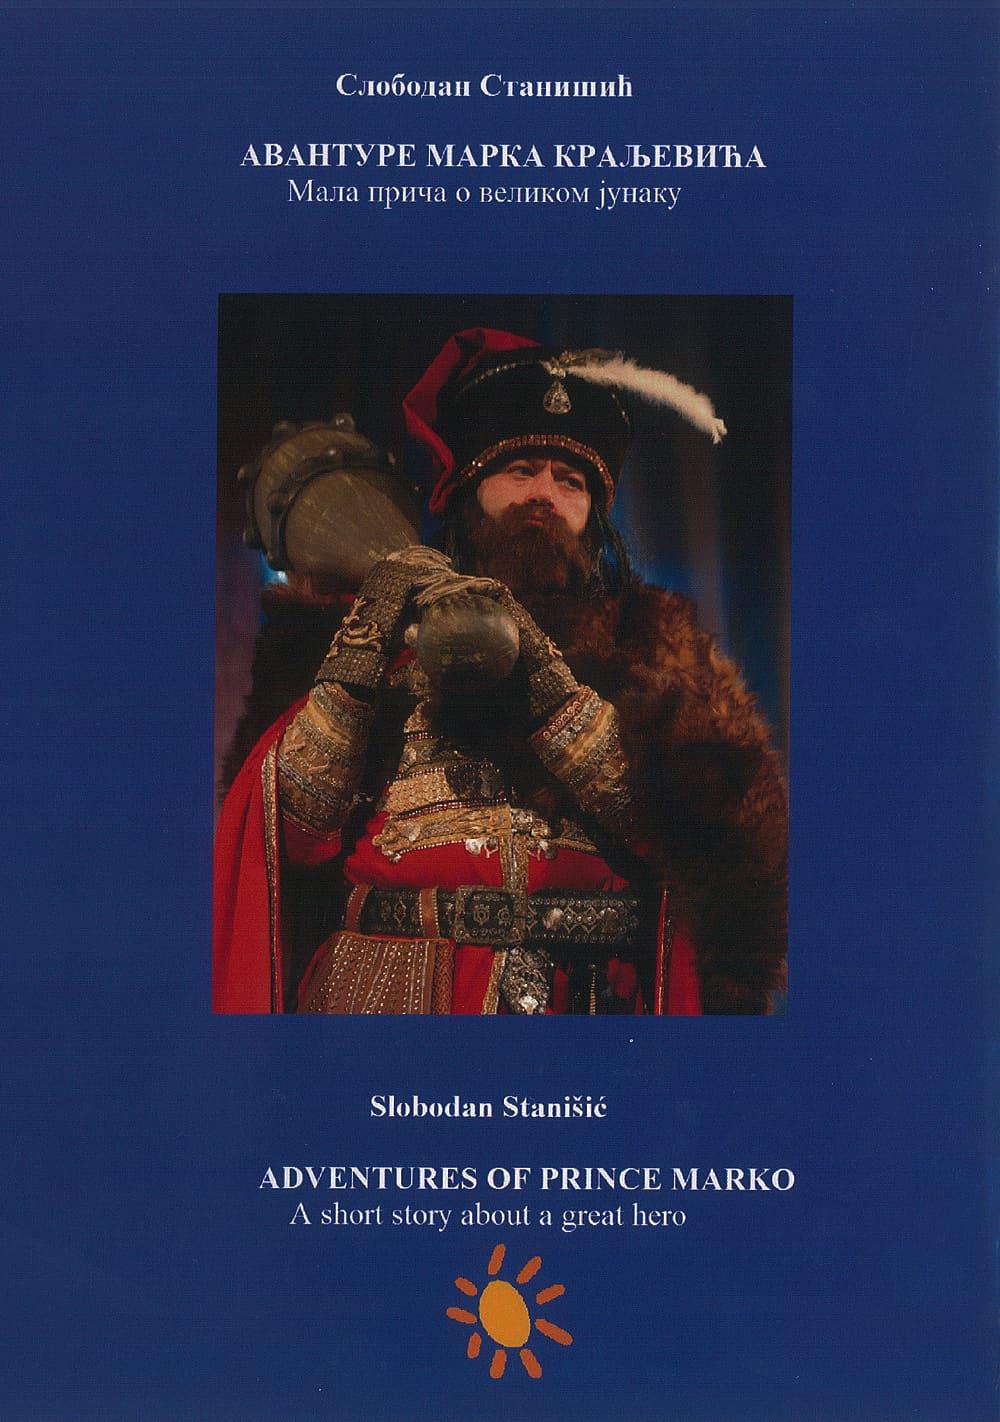 Nova Knjiga Slobodana Stanisica Avanture Marka Kraljevica U